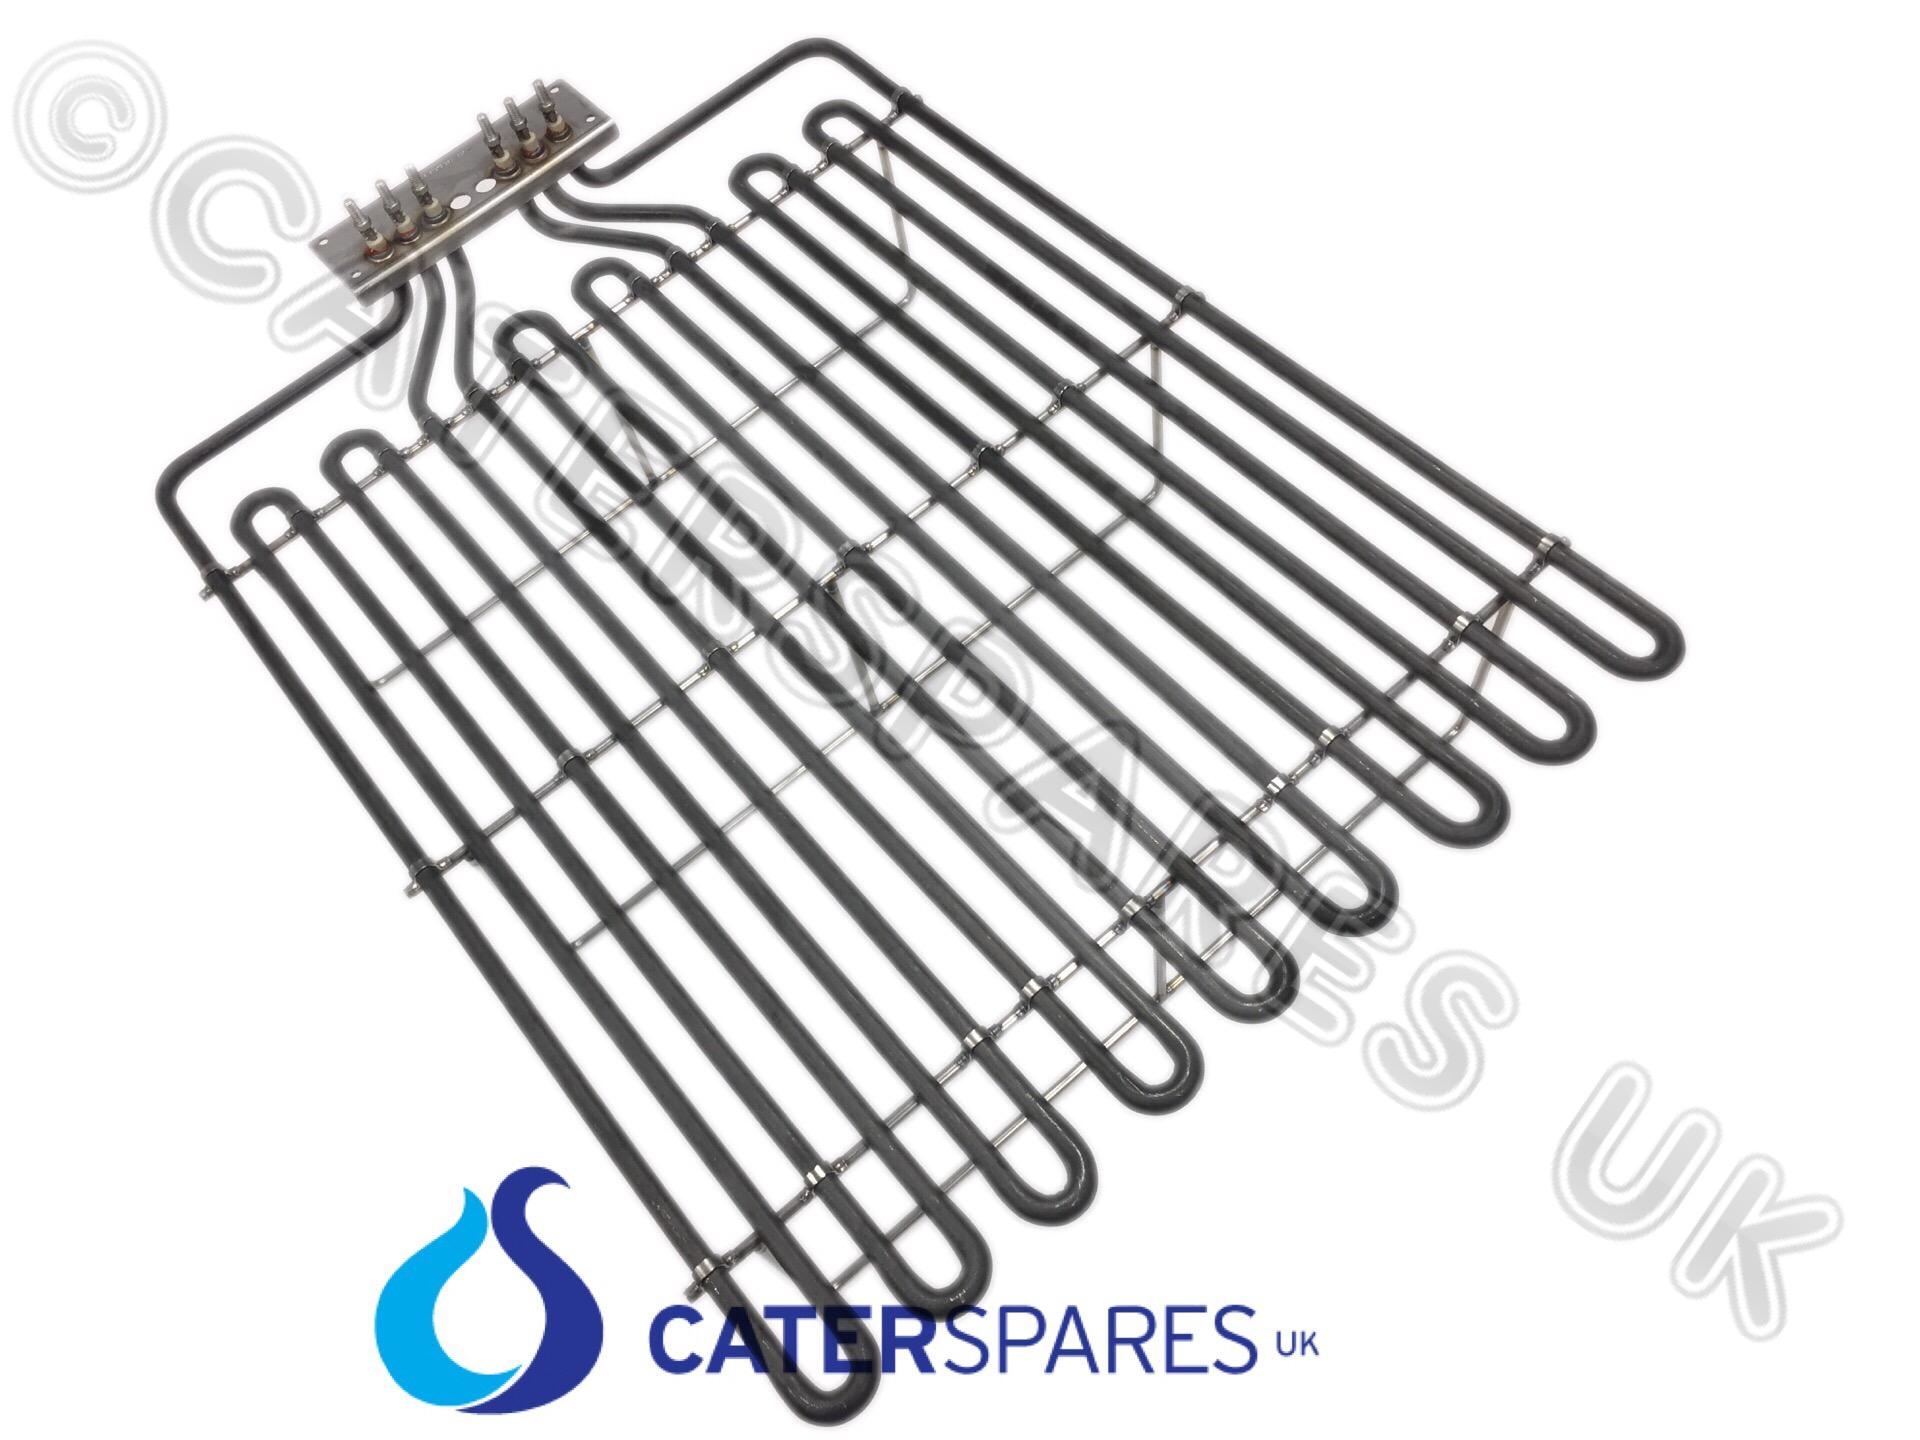 El272 Lincat Electric Chargrill Heating Element Oe 8